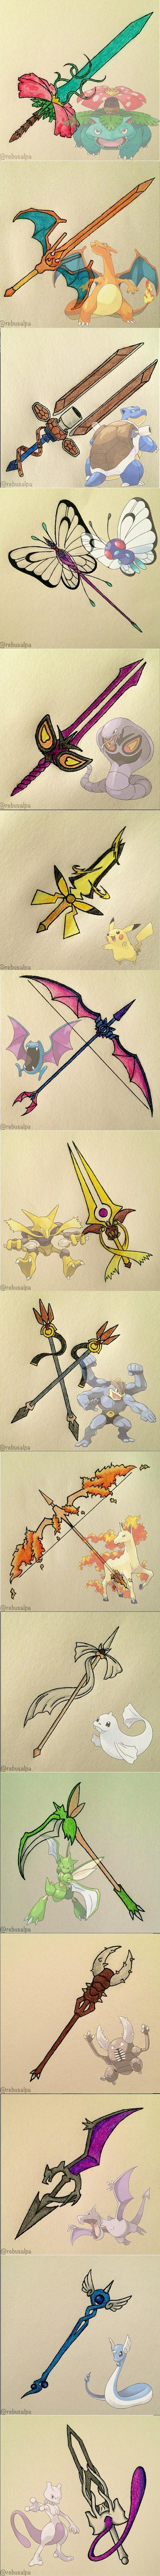 art Pokémon weapons - 8248963840